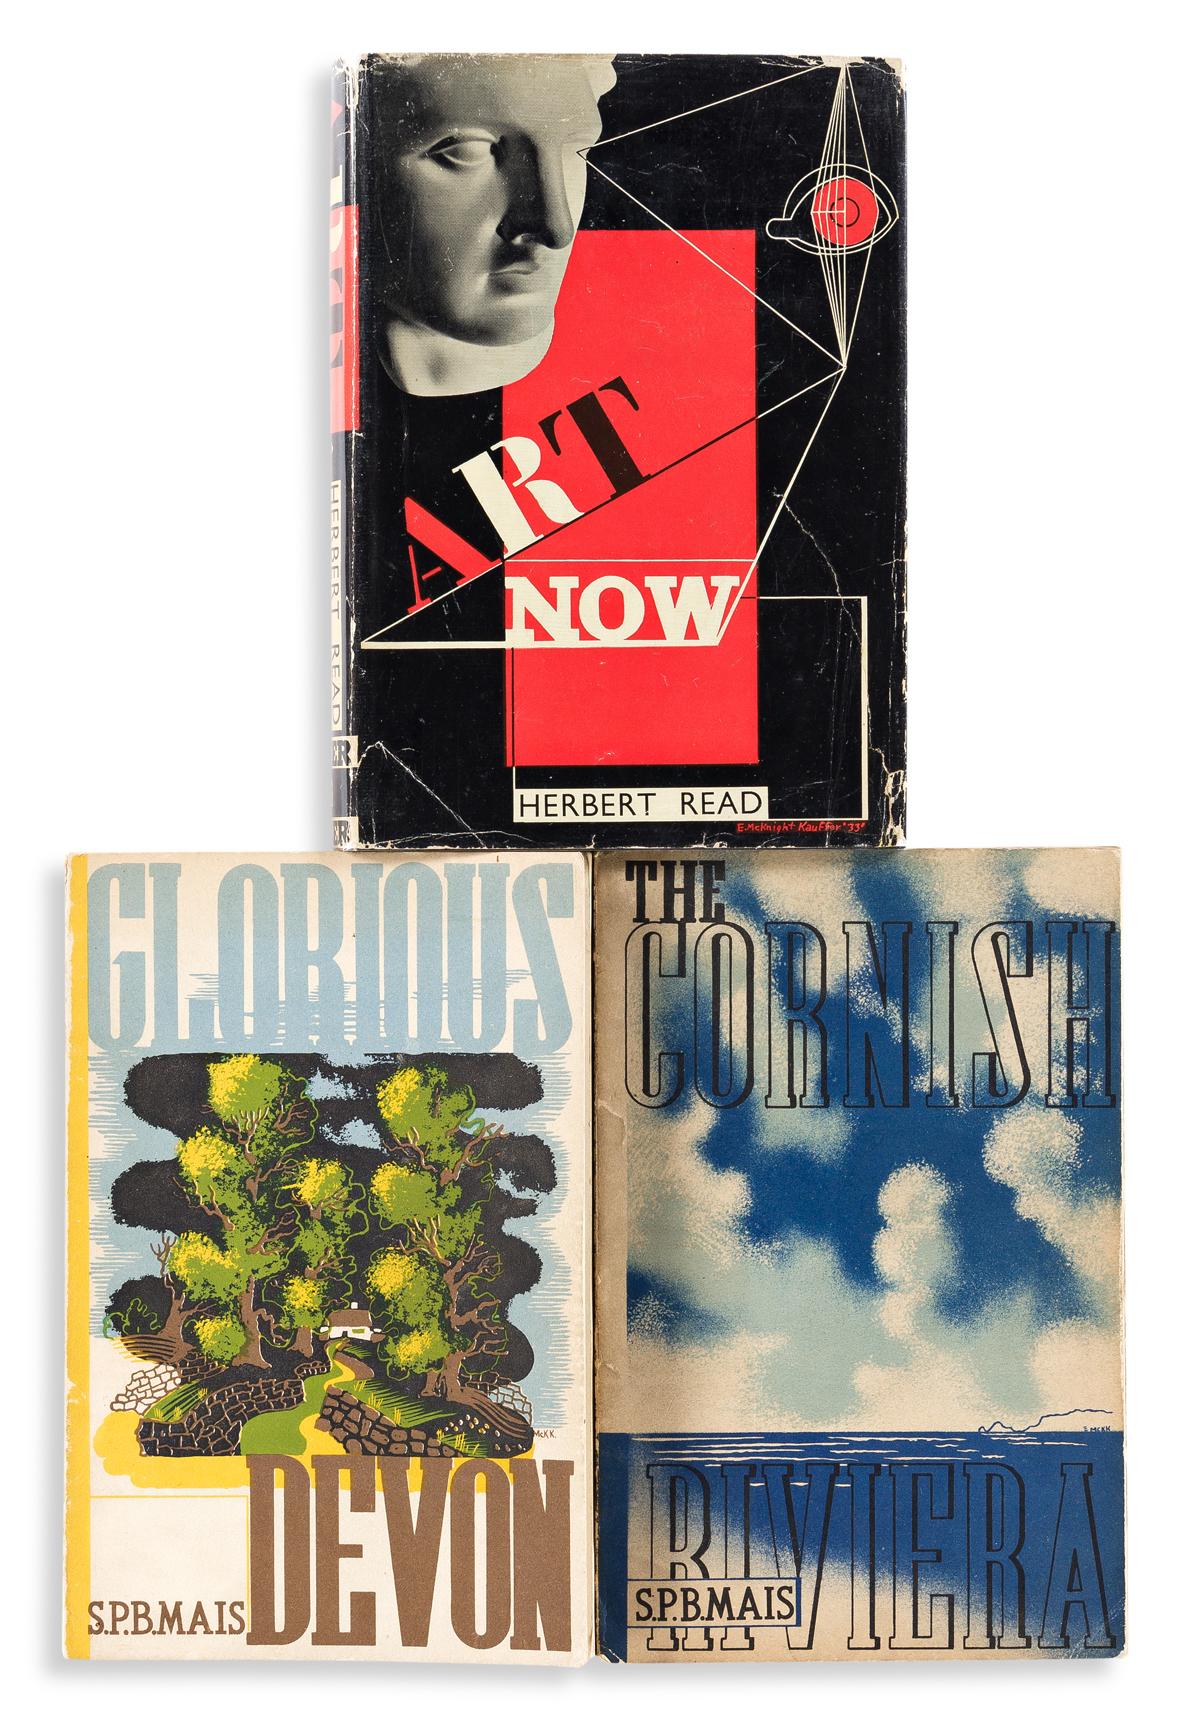 EDWARD MCKNIGHT KAUFFER (1890-1954).  [ART DECO DUST JACKETS & DESIGN]. Group of 7 books. 1920s-30s. Sizes vary.